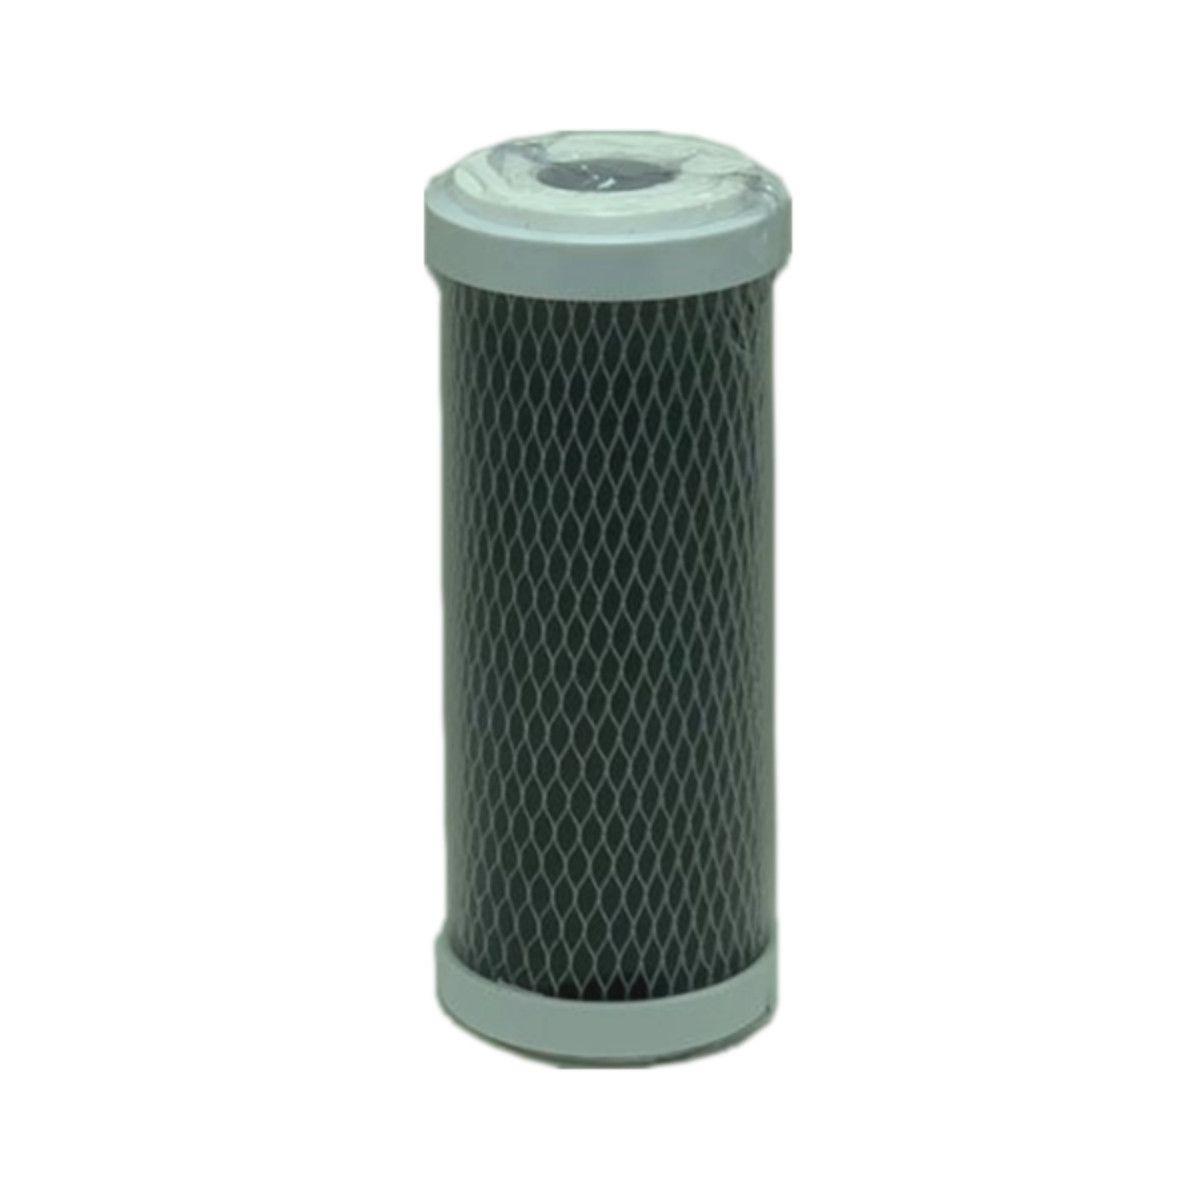 Refil Vela Filtro Pou 7 Eco Prima Carbon Block 7